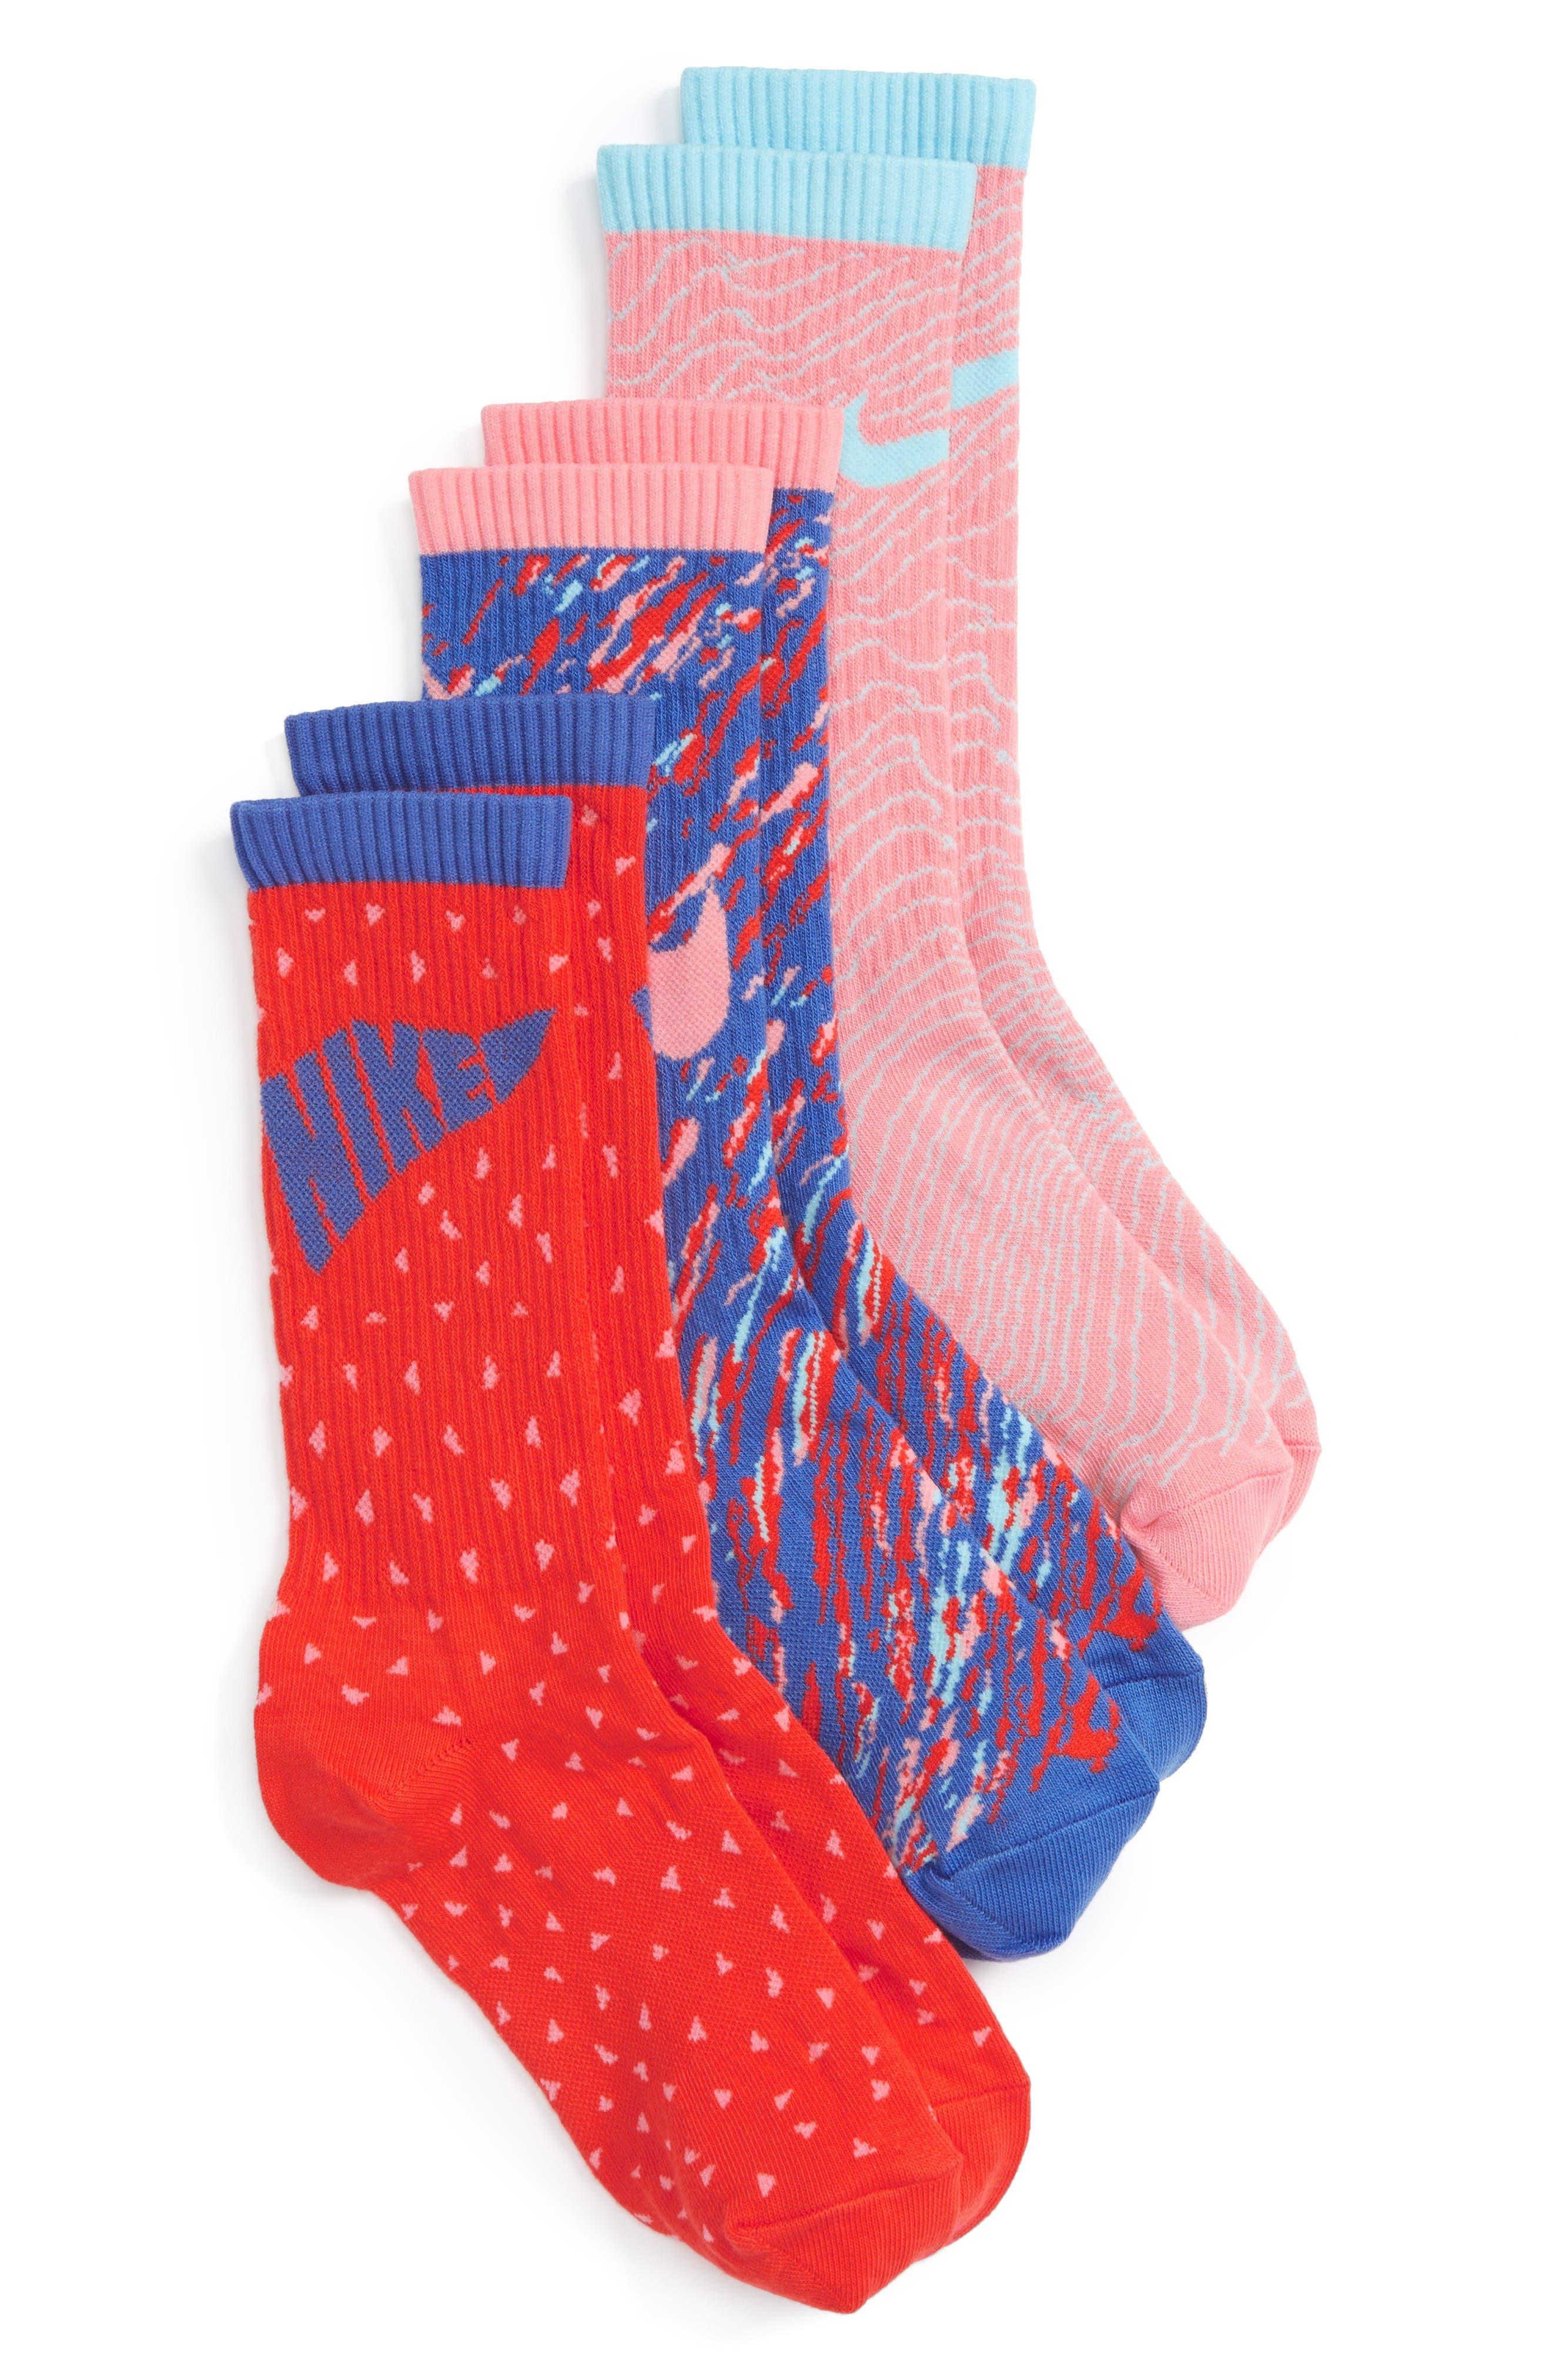 Alternate Image 1 Selected - Nike 3-Pack Graphic Crew Socks (Walker, Toddler, Little Kid & Big Kid)